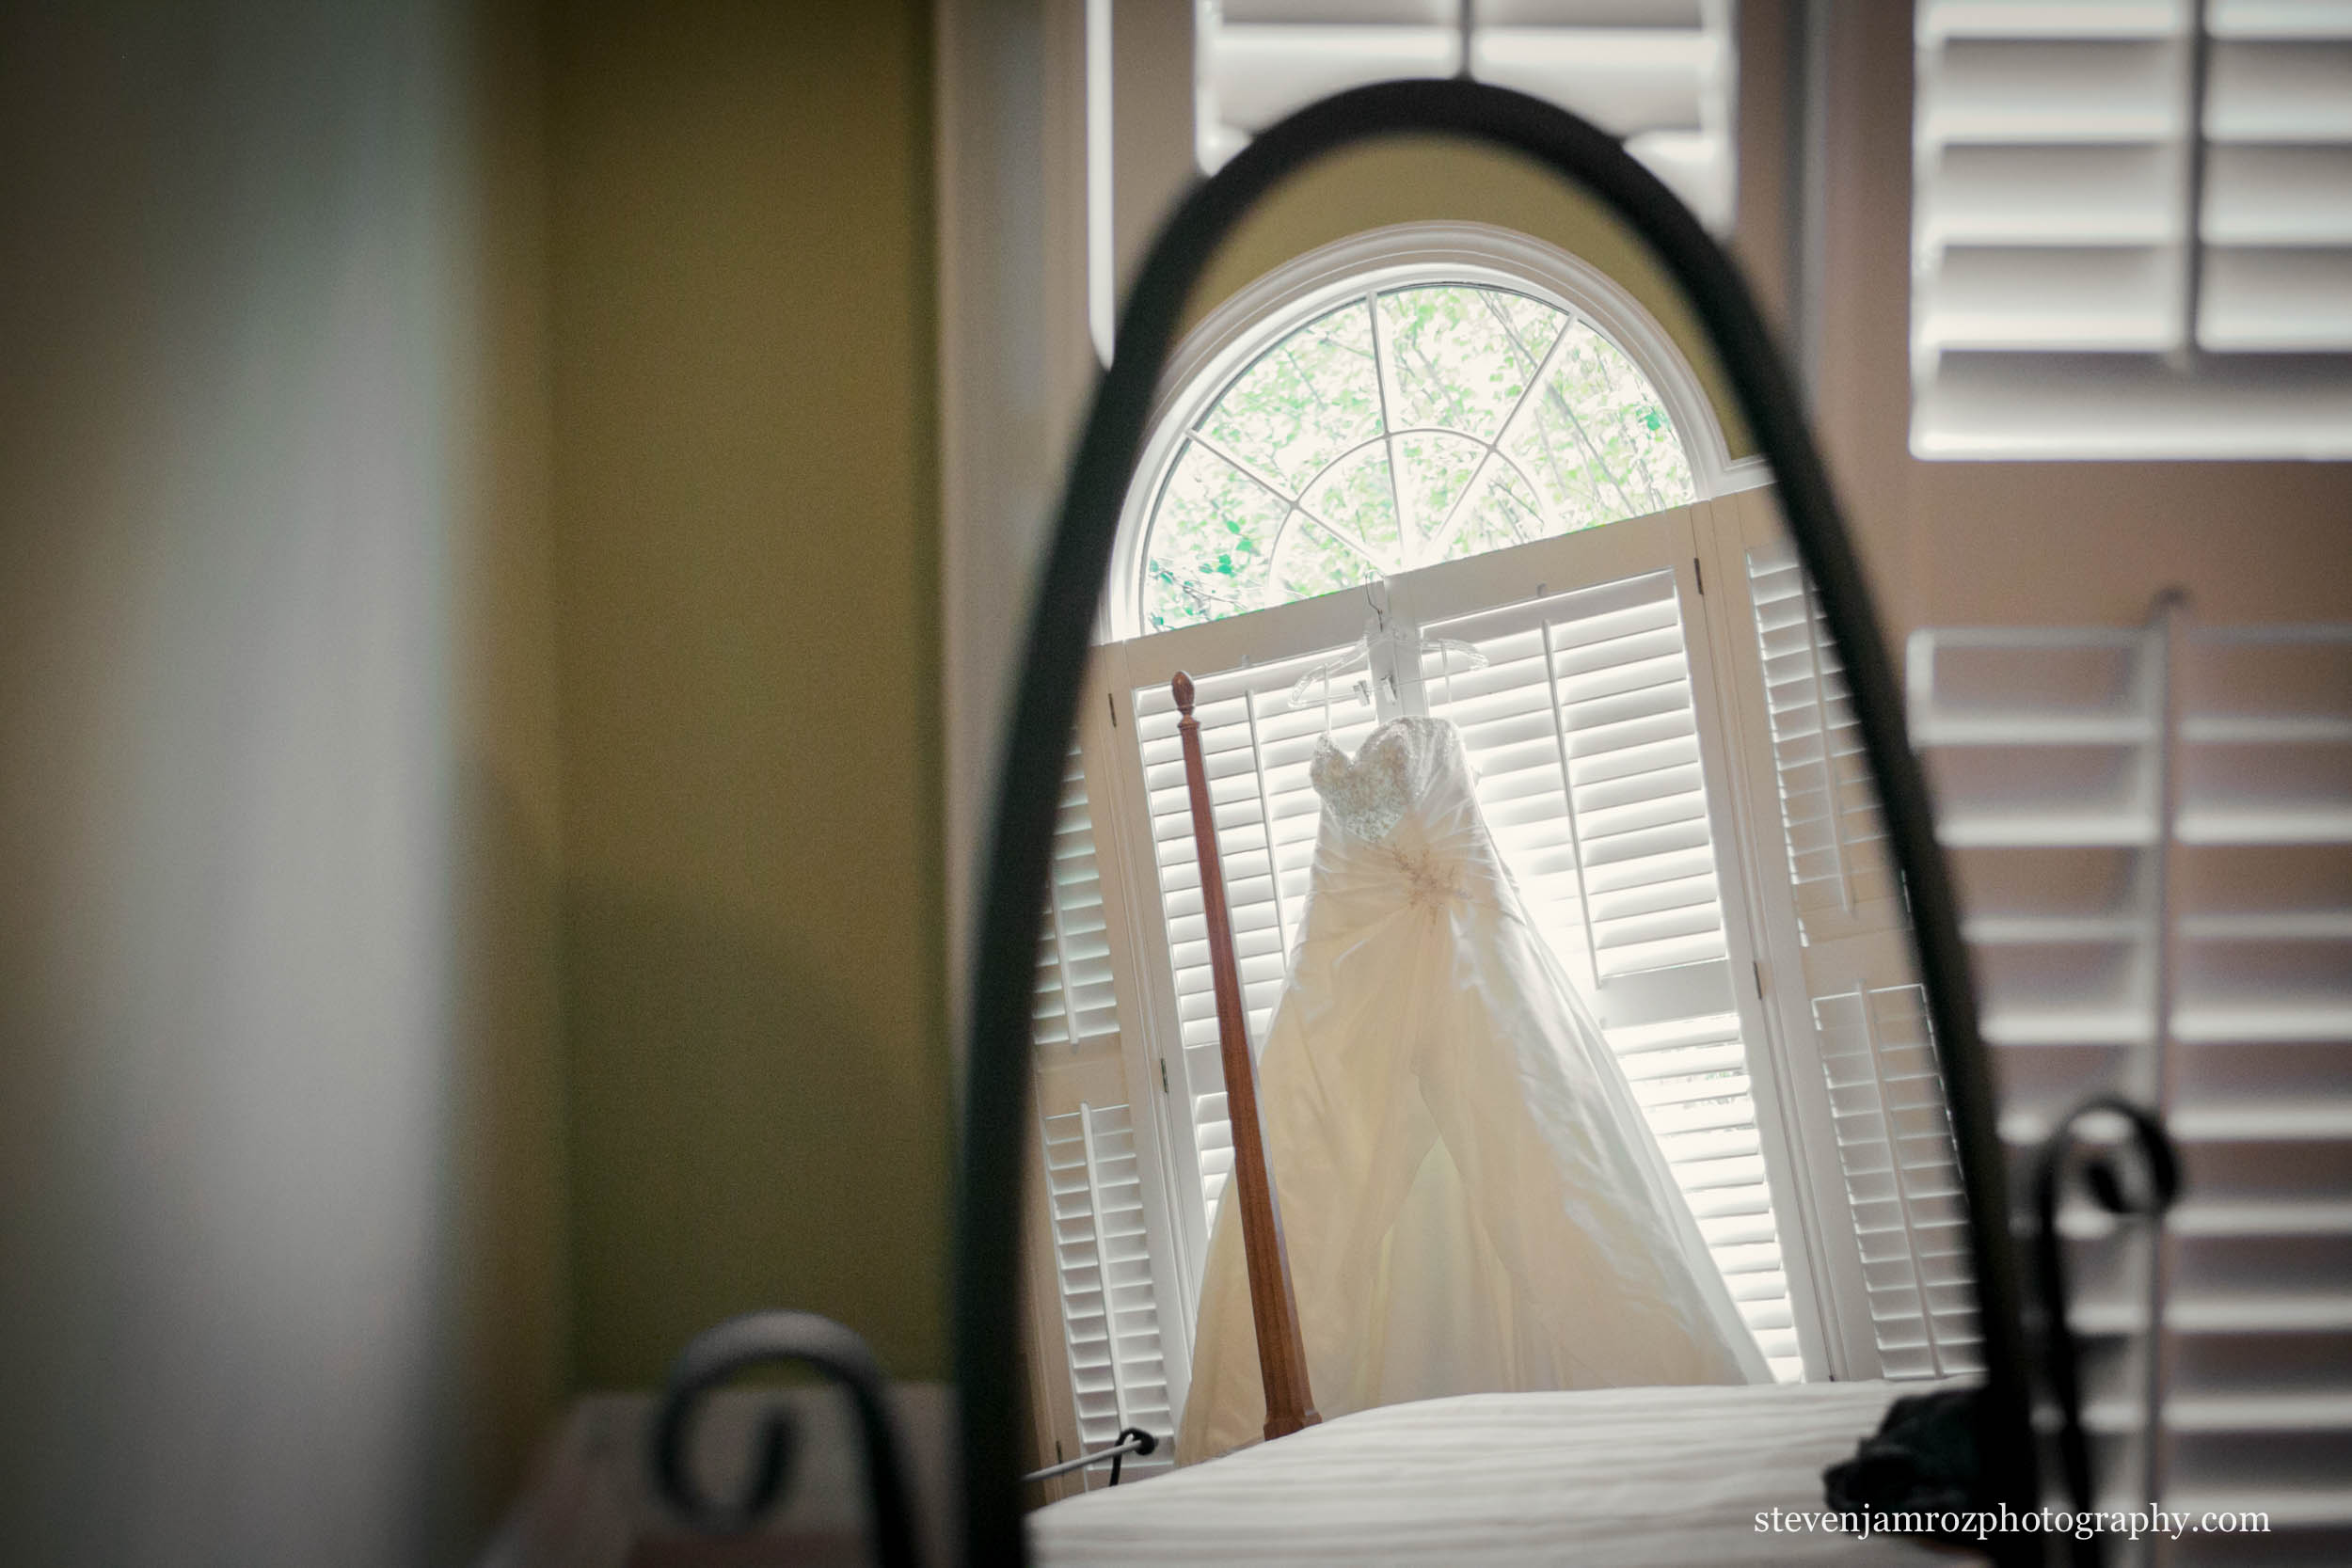 mirror-dress-hanging-wedding-raleigh-steven-jamroz-0700.jpg